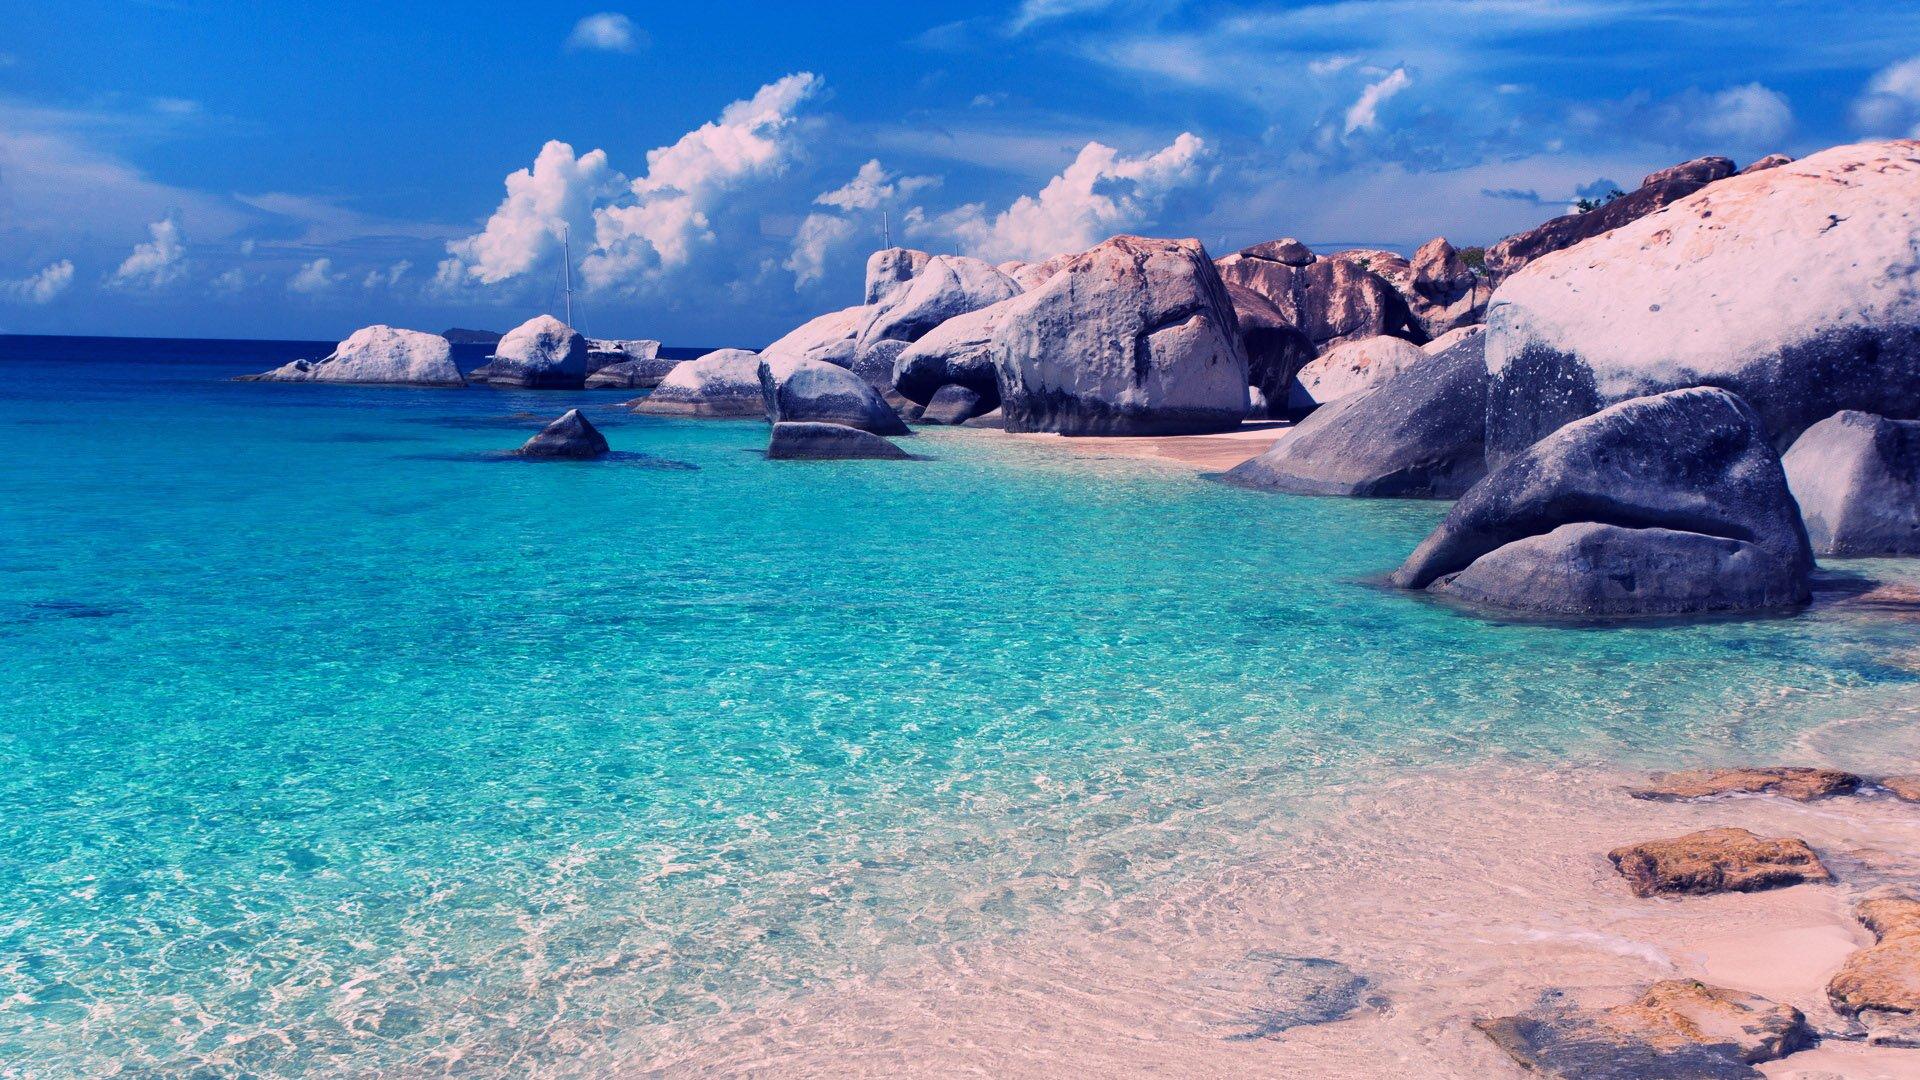 Beautiful Beach Backgrounds 1920 215 1080 Wallpaper 1920x1080